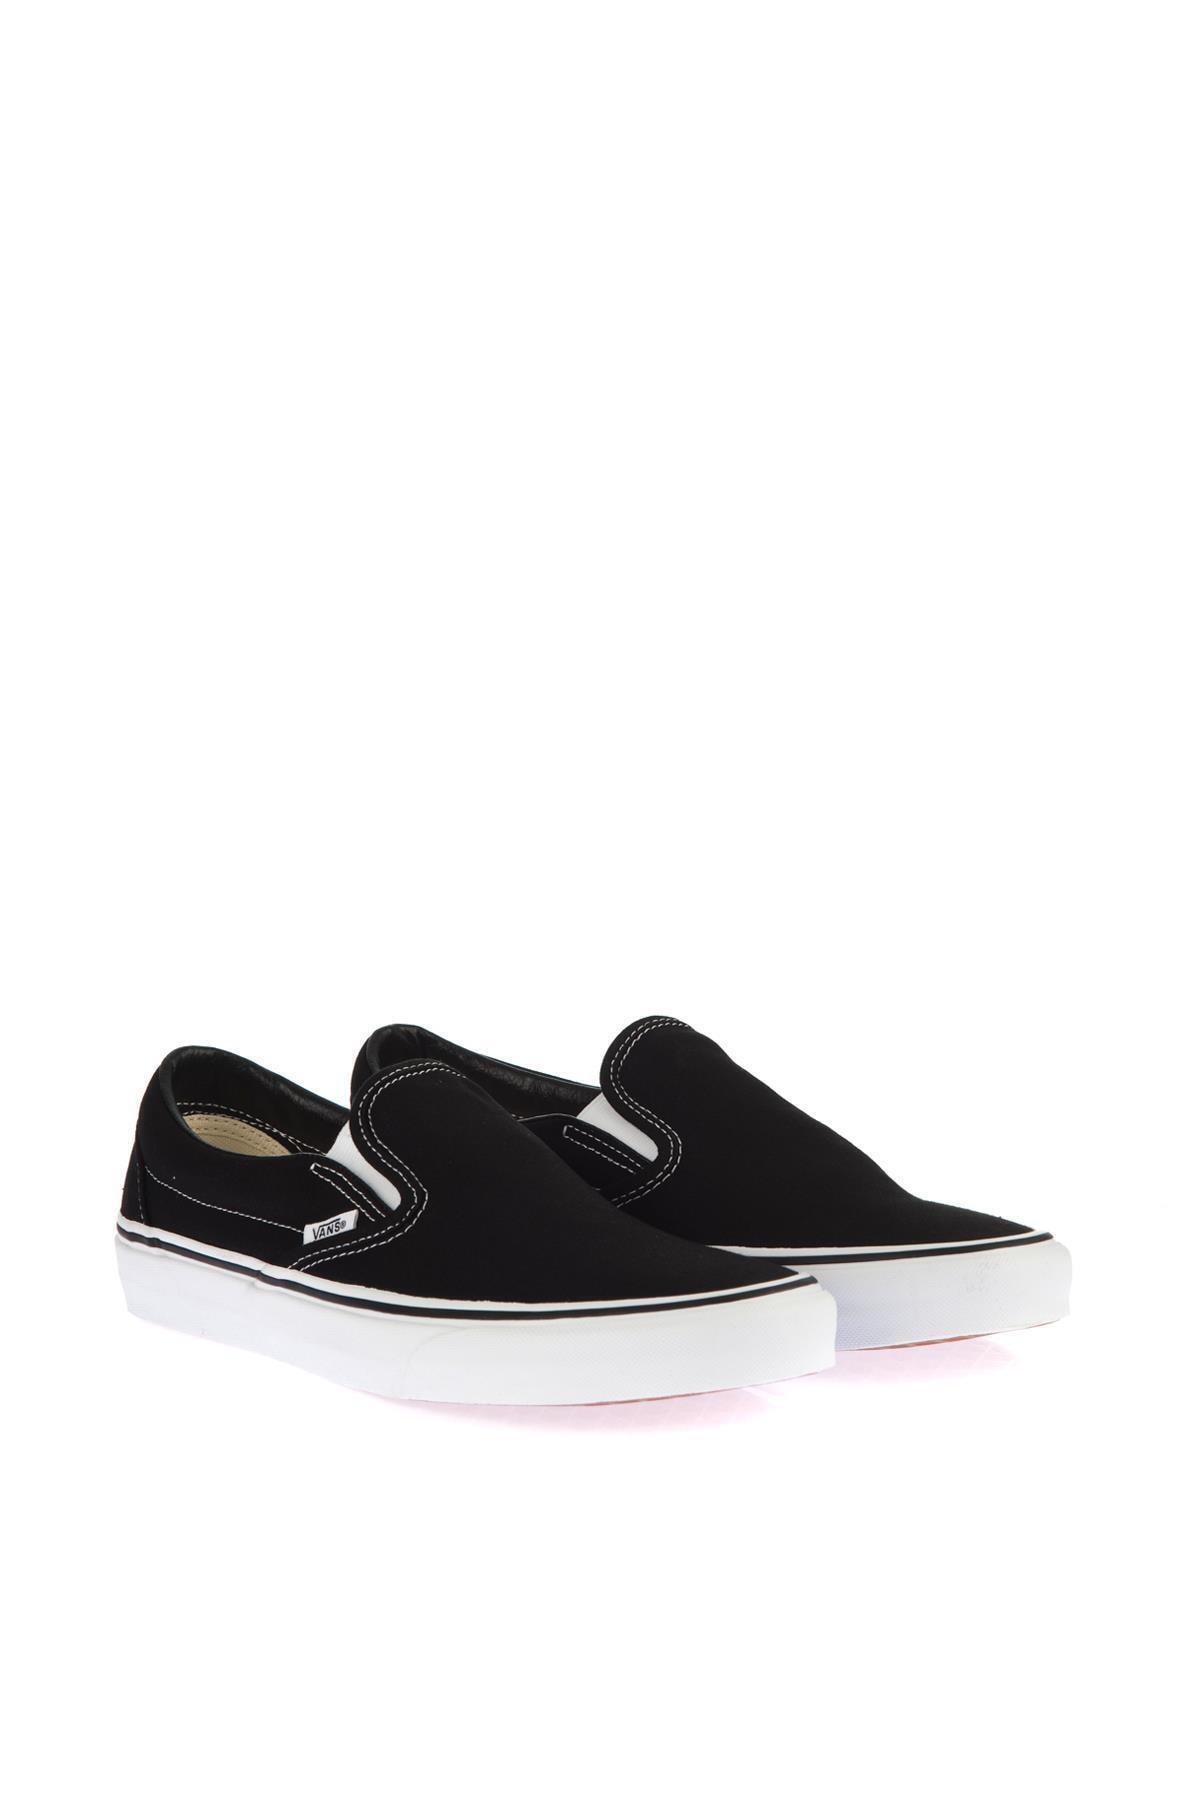 Vans CLASSIC SLIP-ON Siyah Erkek Sneaker 100288346 2